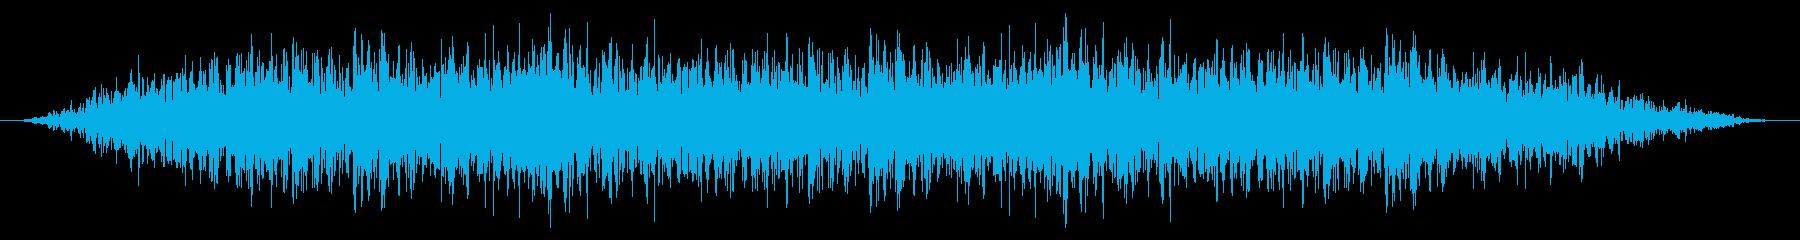 SNES サッカー01-08(歓声)の再生済みの波形